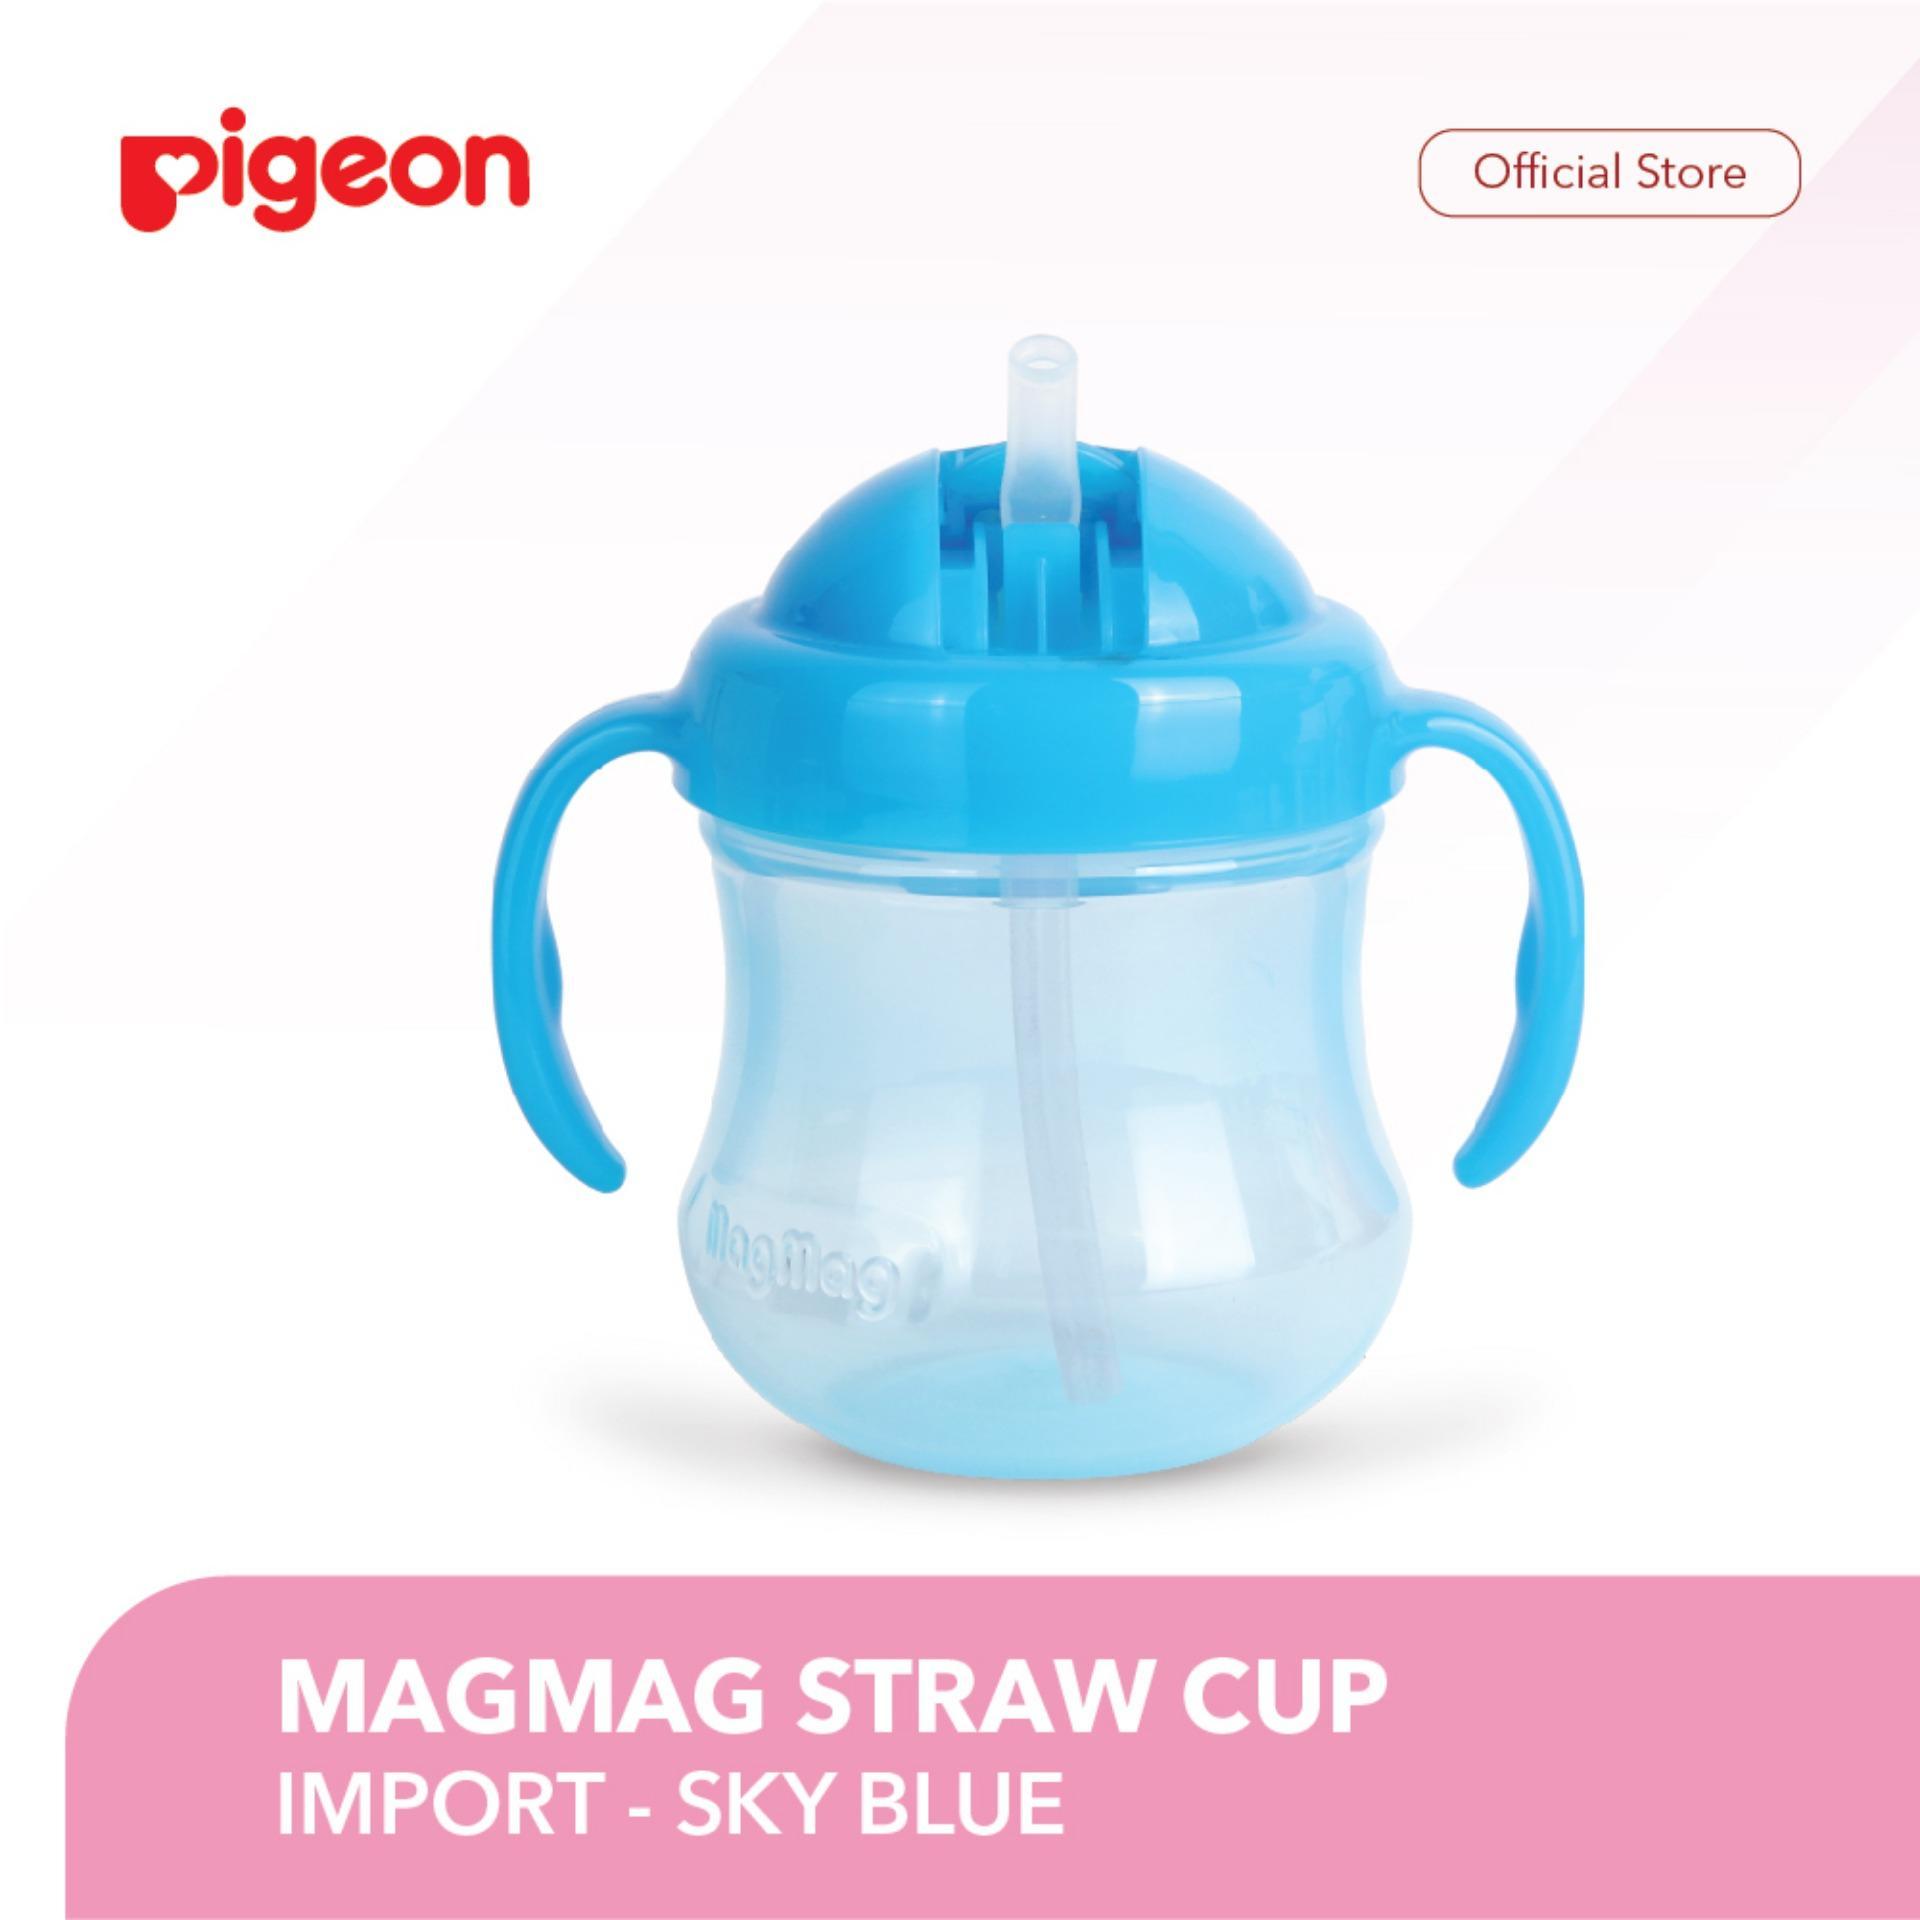 Home · Pigeon Petite Straw Bottle 150ml Biru Pigeon Training Cups; Page - 4.